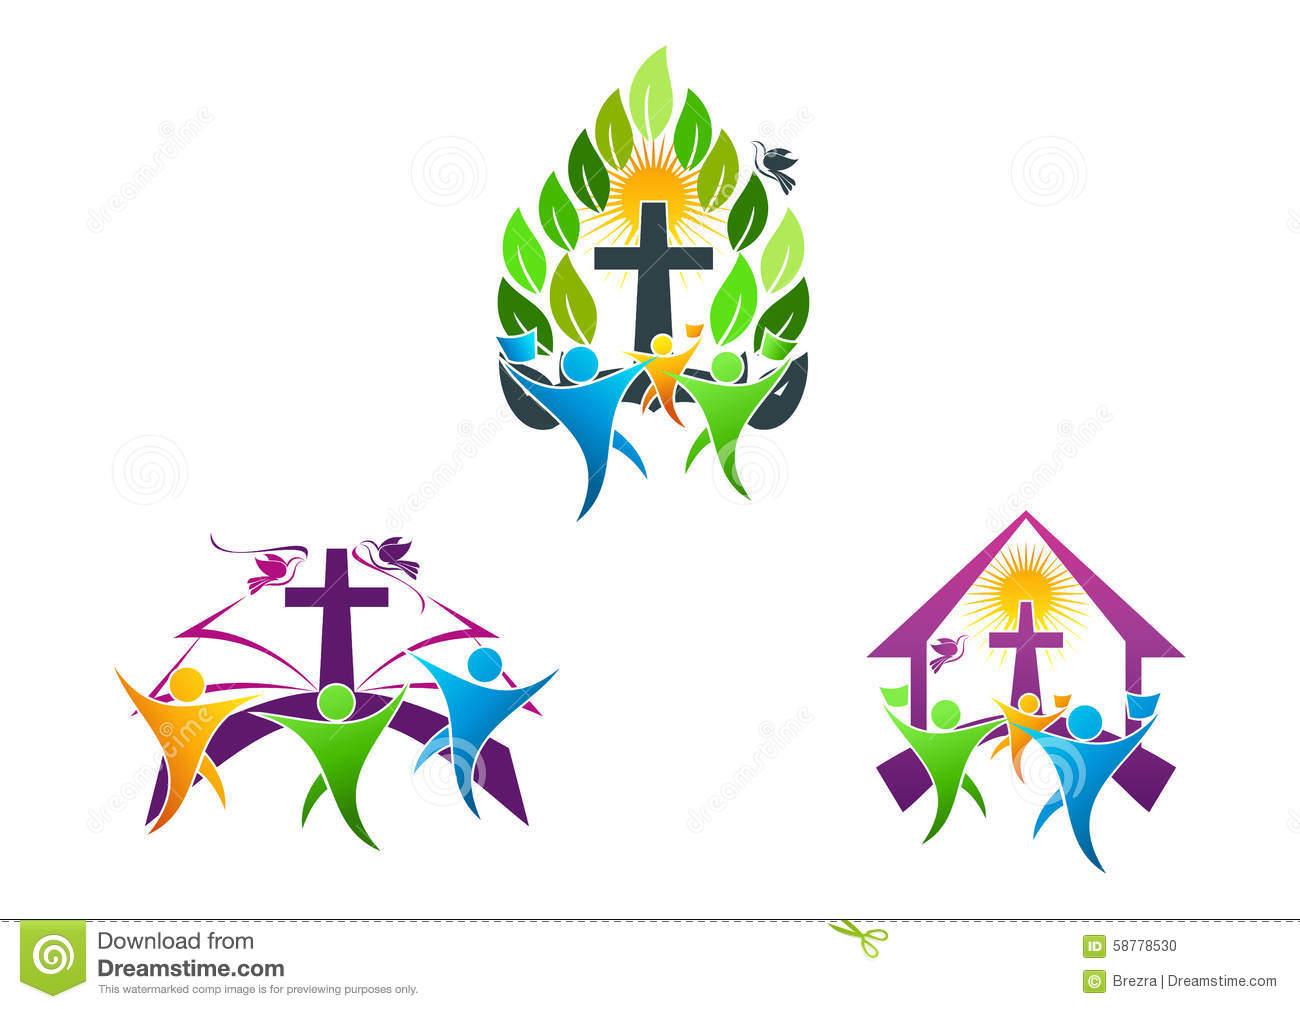 Christian logo clipart freeuse stock Christian Family Clipart   Free download best Christian Family ... freeuse stock